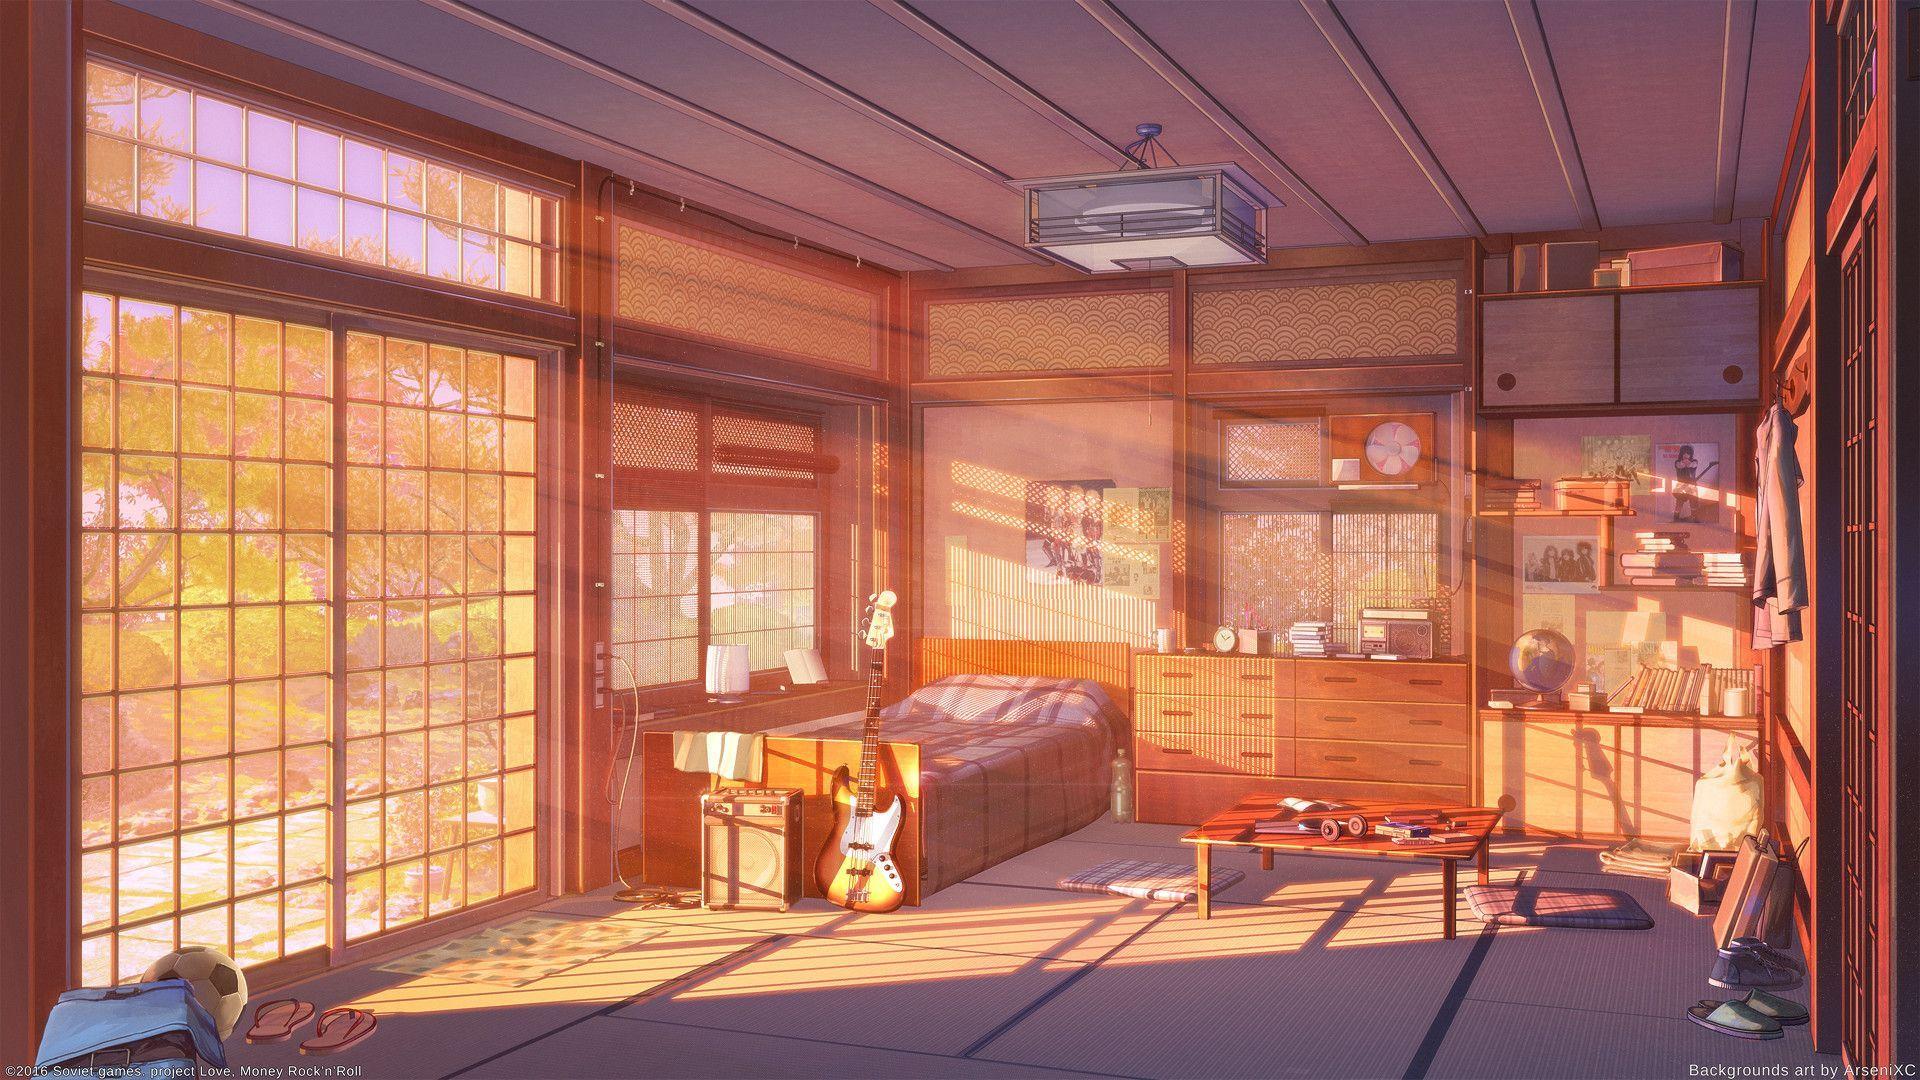 Anime Bedroom Scenery Wallpapers Wallpaper Cave